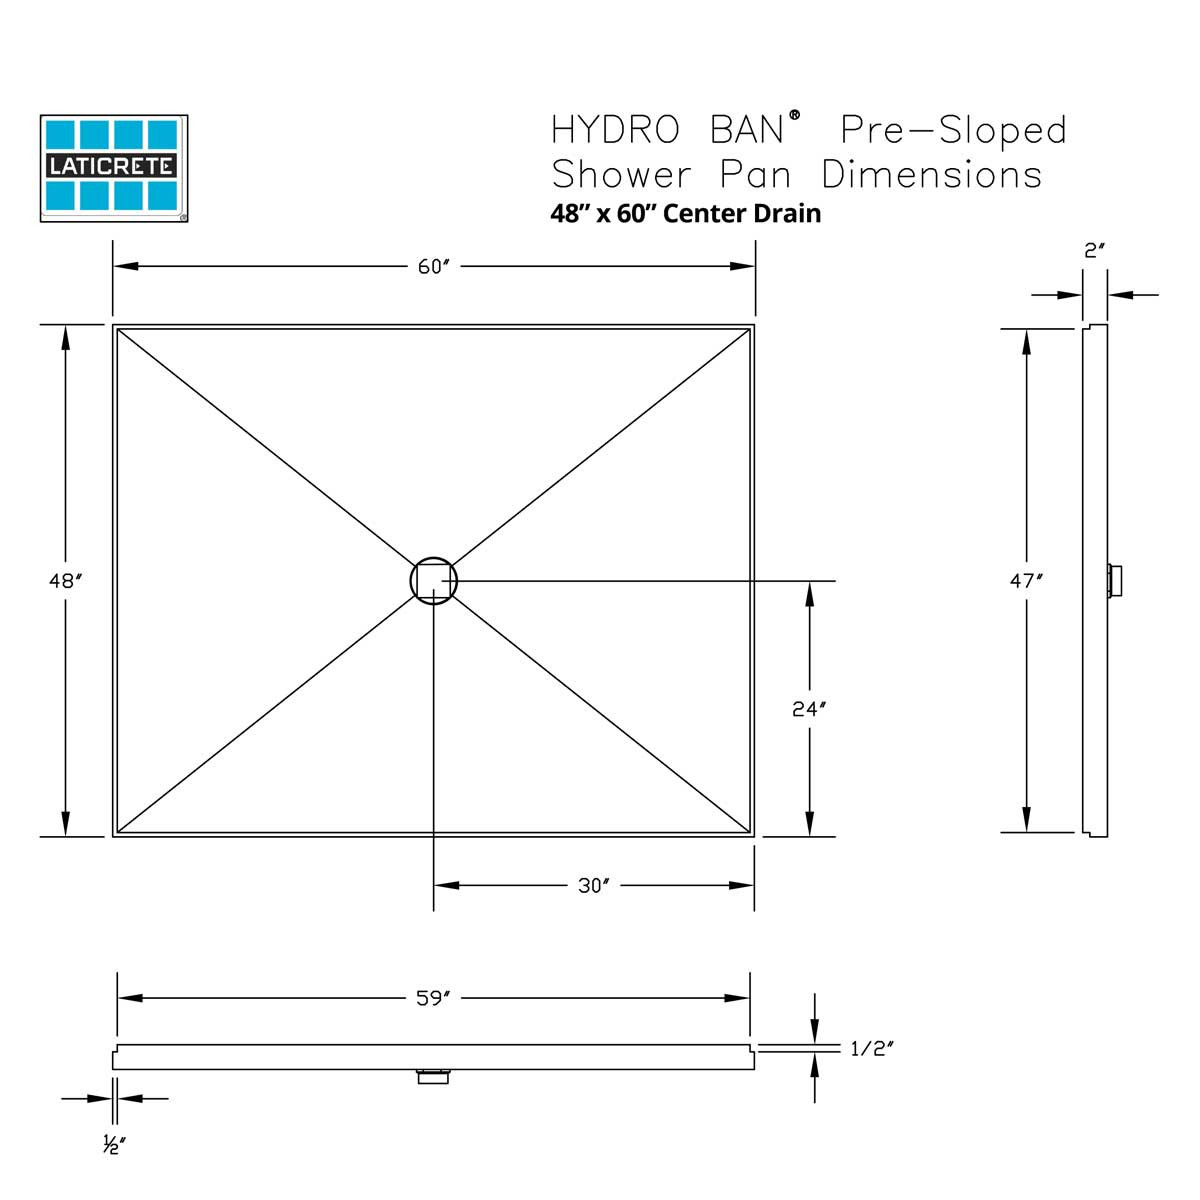 9360-4860-PVC Center Drain Laticrete Hydro Ban Pre-sloped Shower Pan